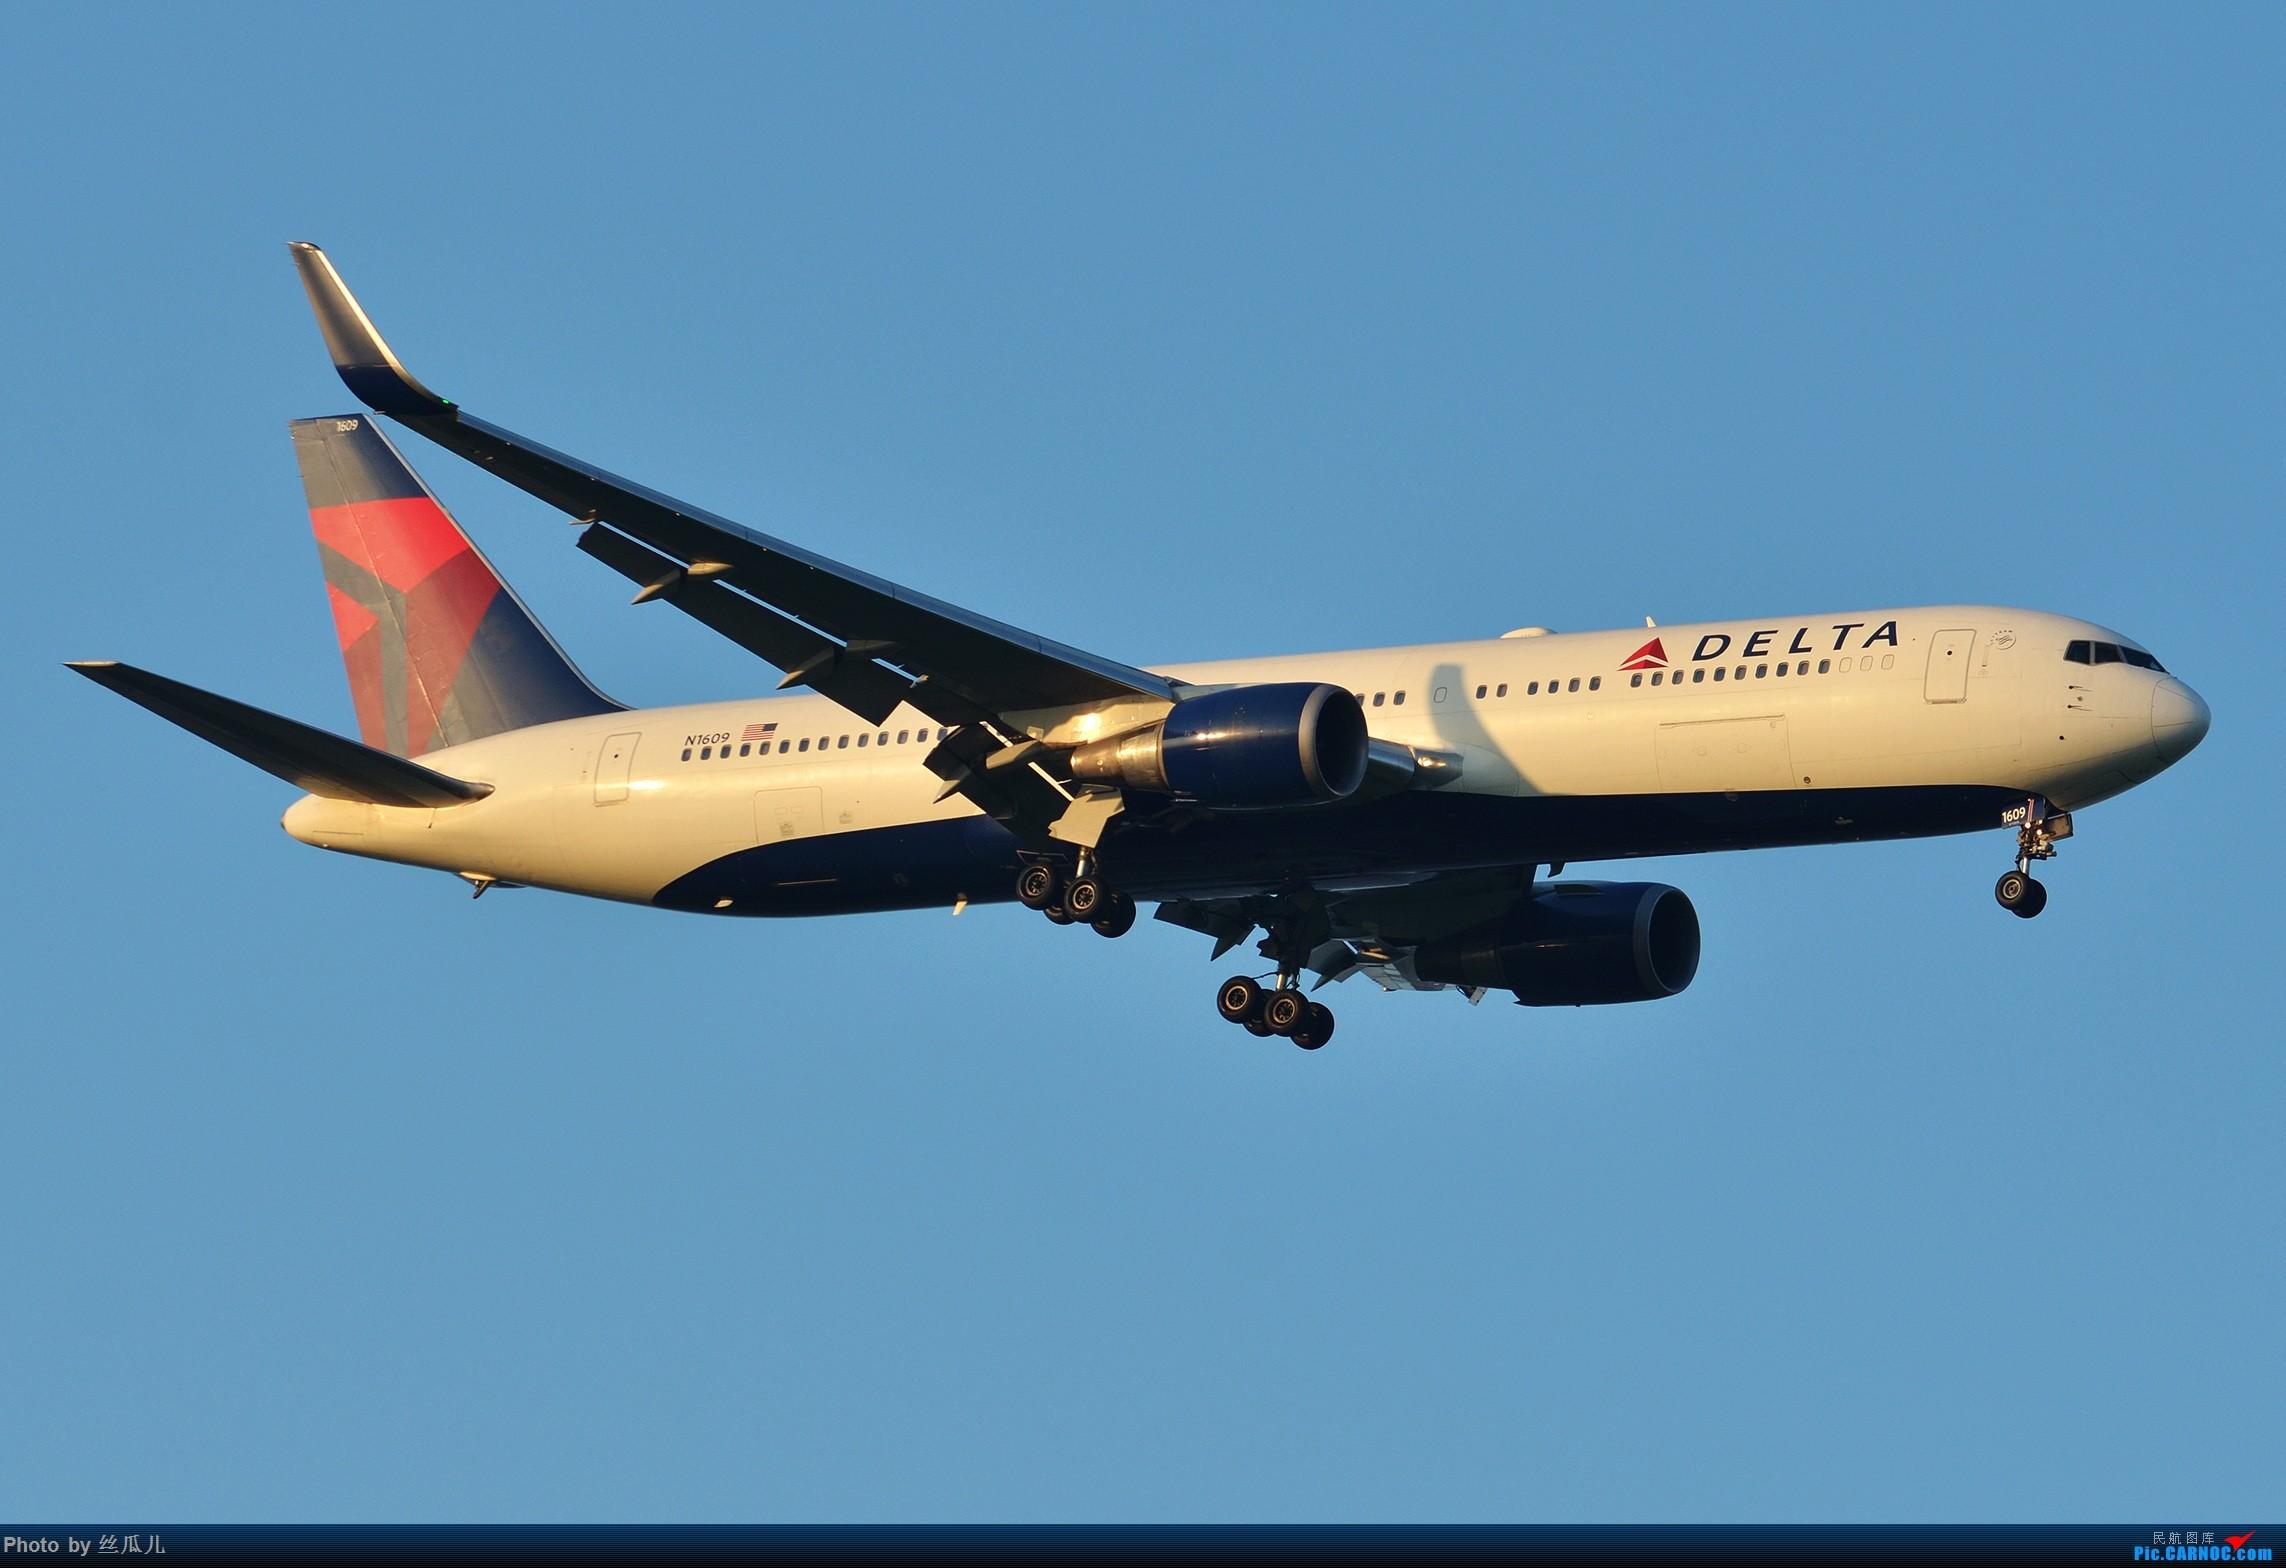 Re:[原创]【徘徊在HGH的丝瓜】瓜哥的高温福利再一波----7月20日的达美打包贴 BOEING 777-300ER N1609 中国上海浦东国际机场